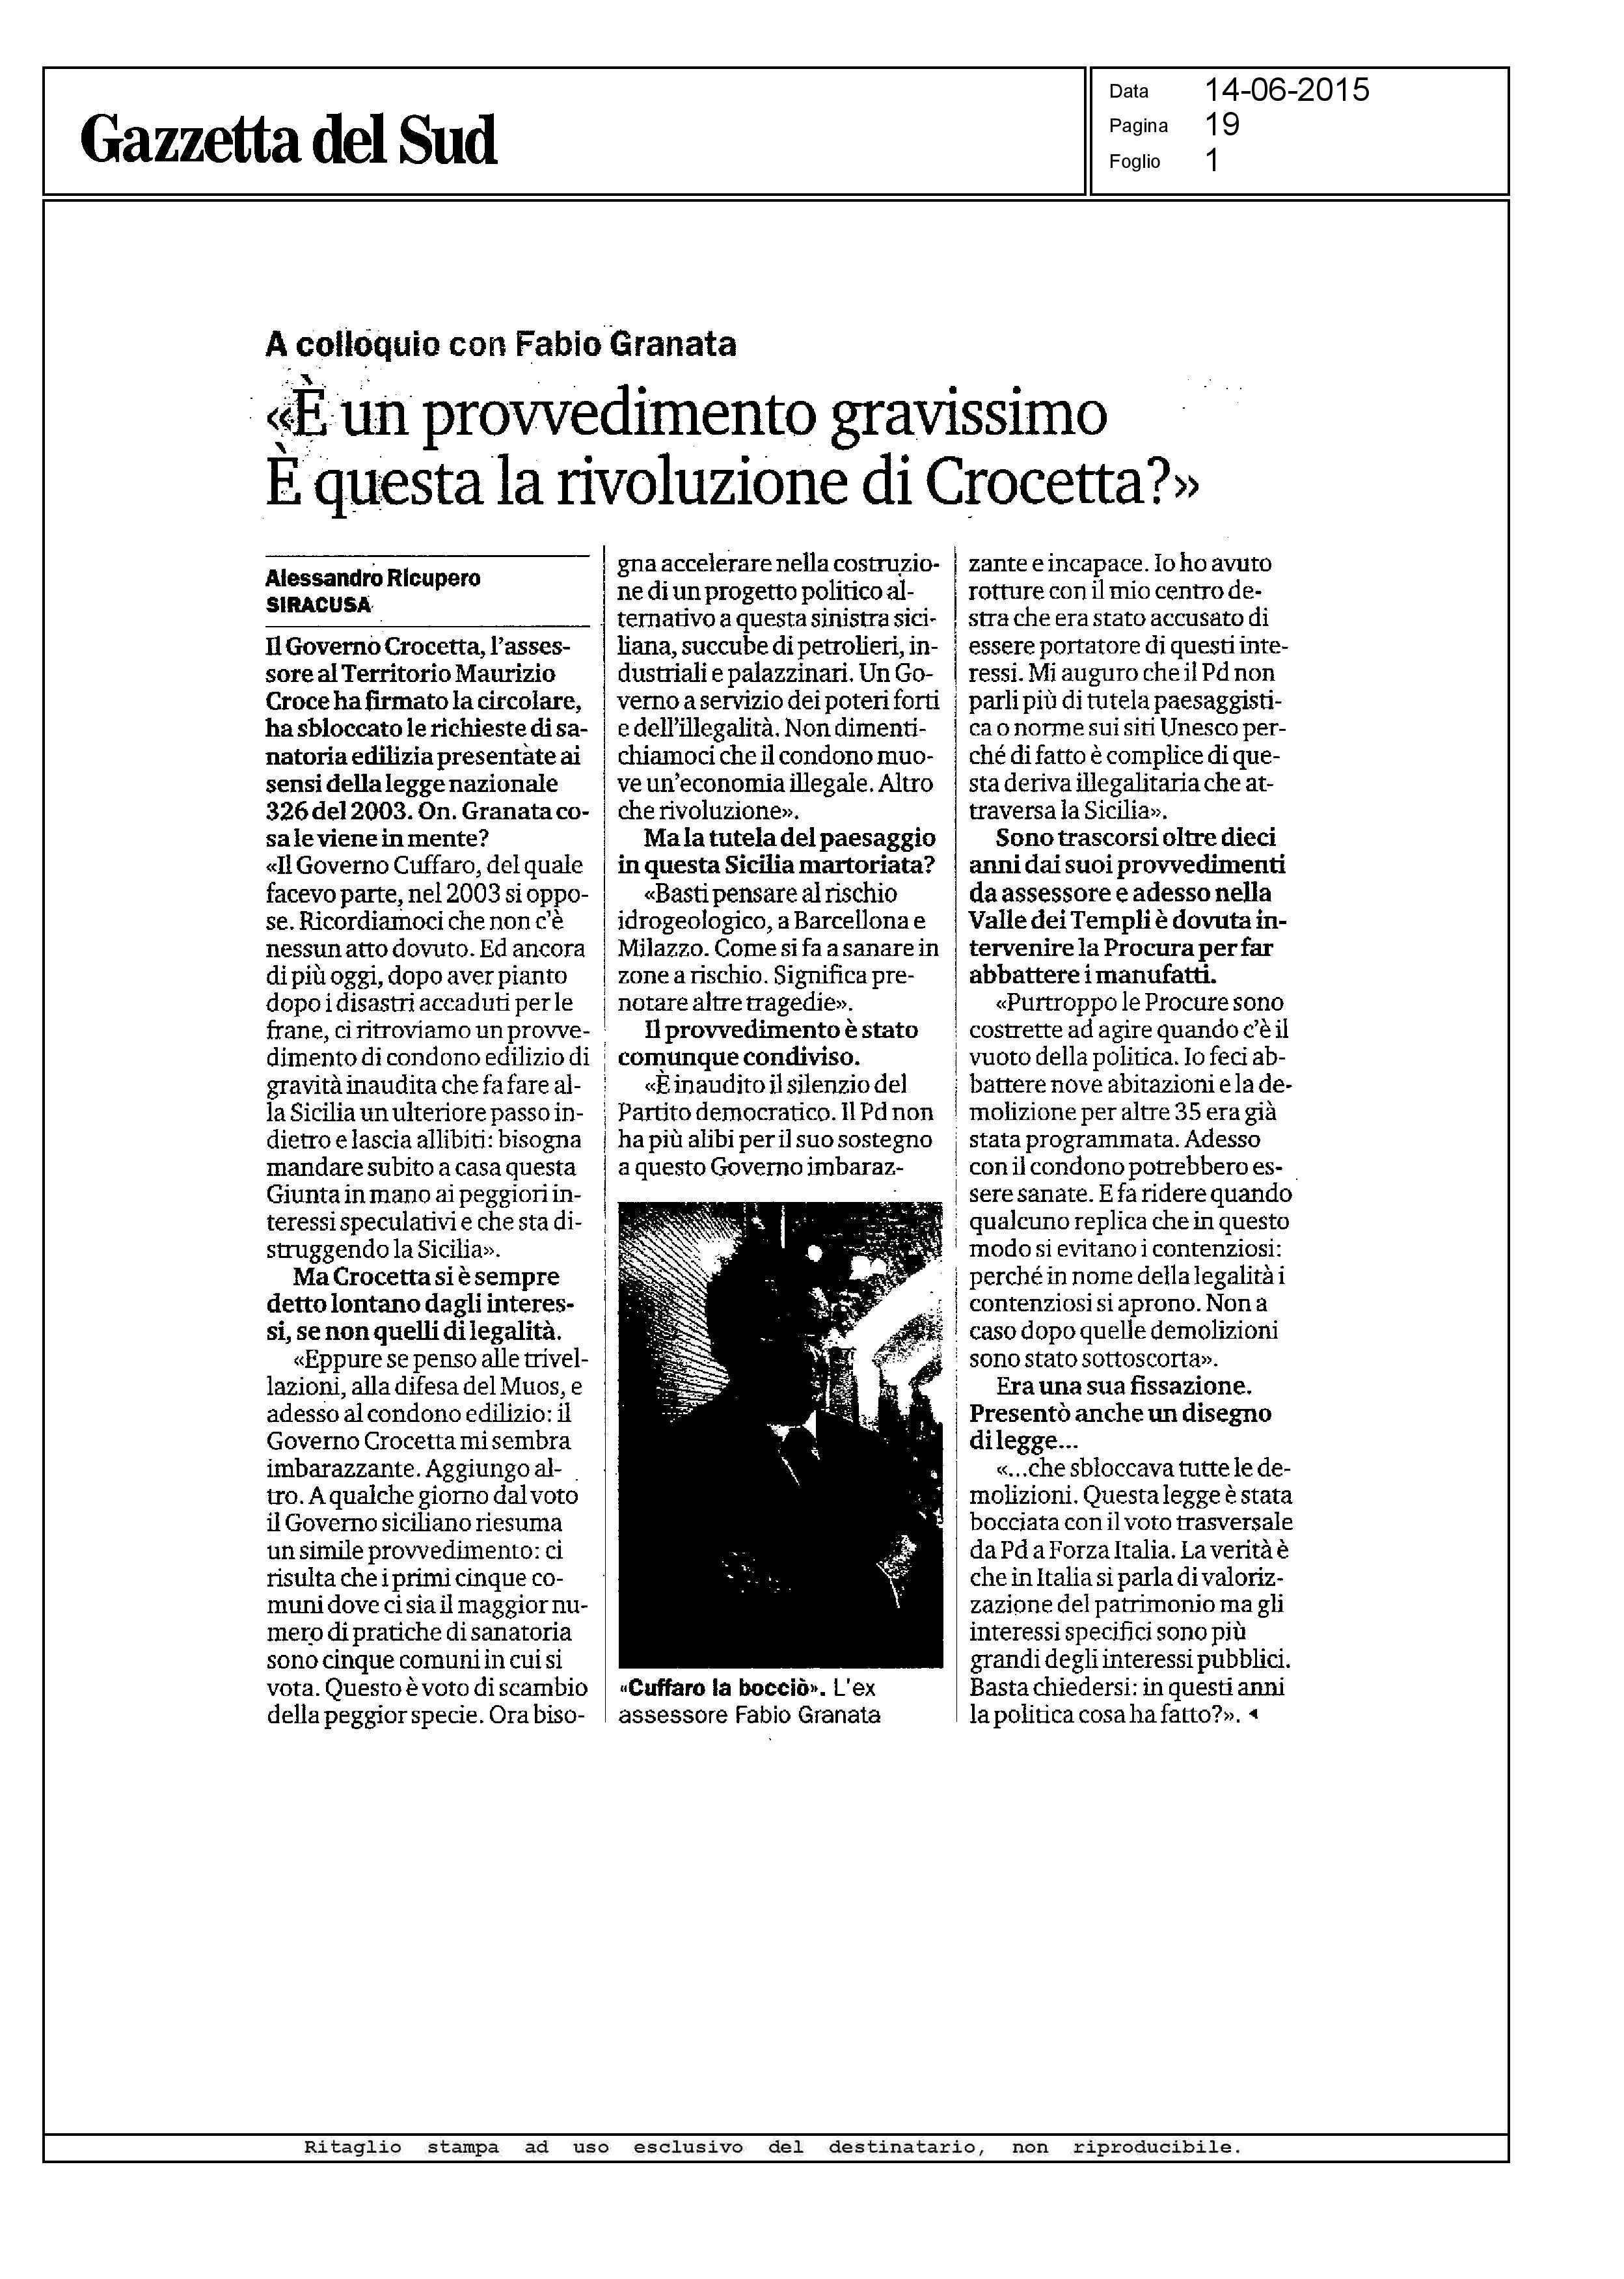 gazzetta-page-001